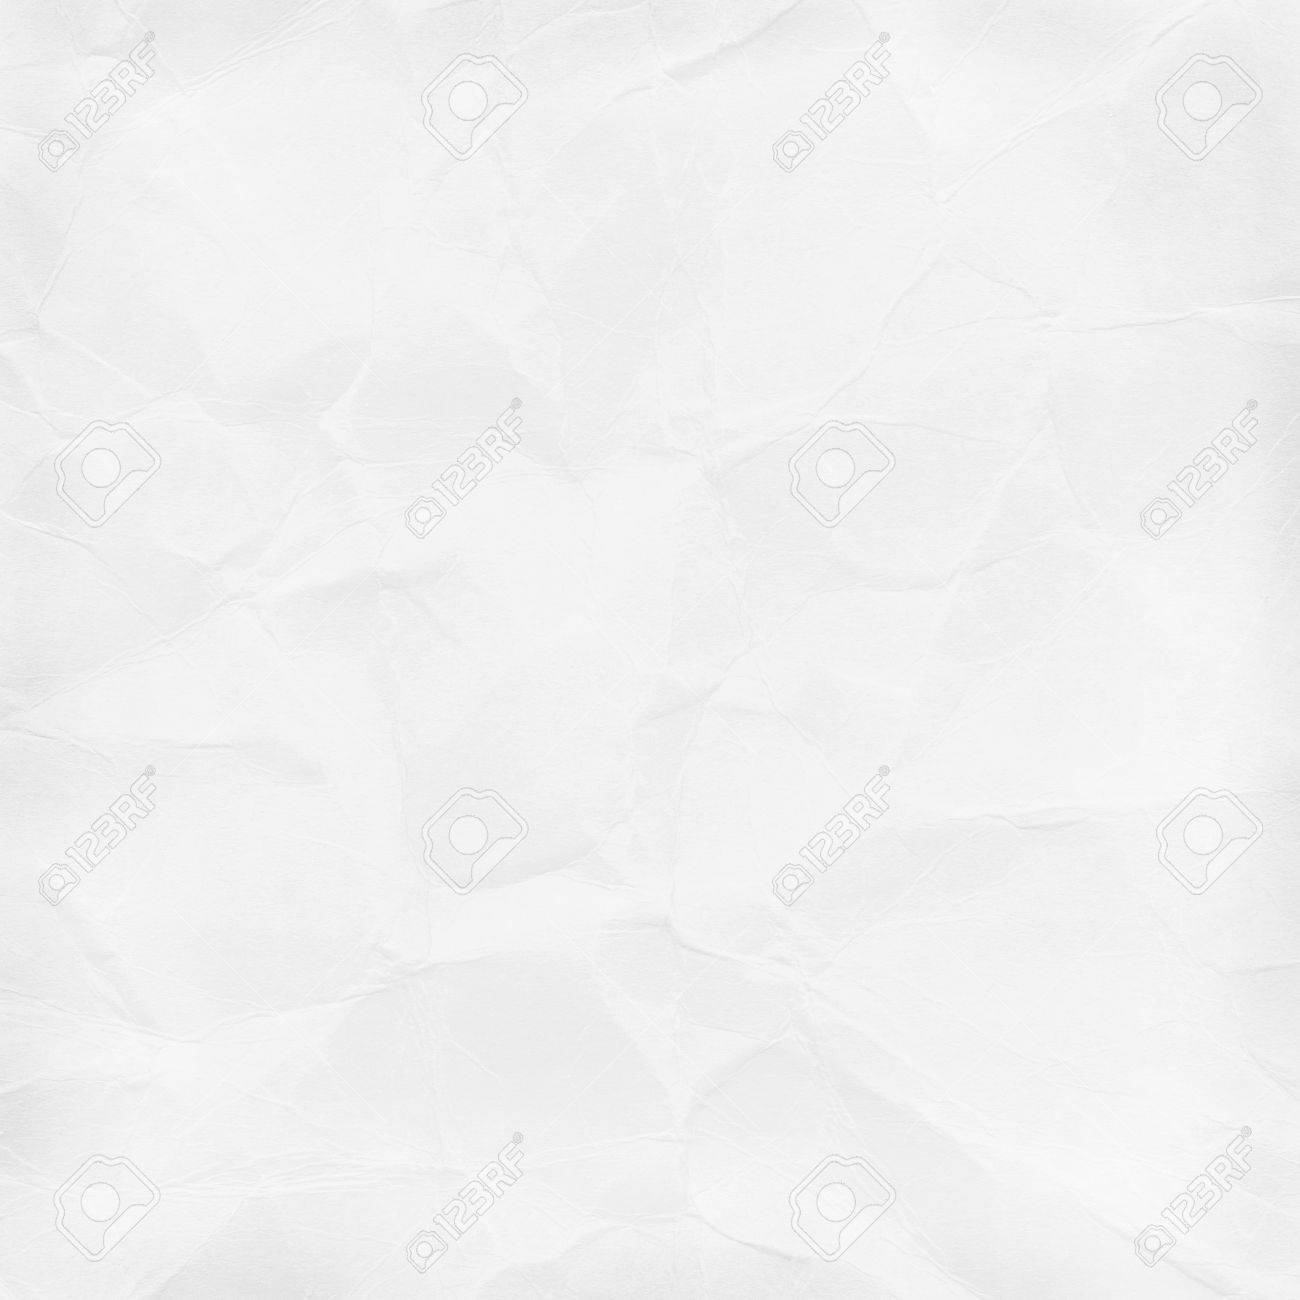 Immagini Stock Bianco Carta Depoca Sfondo Bianco Image 50090578